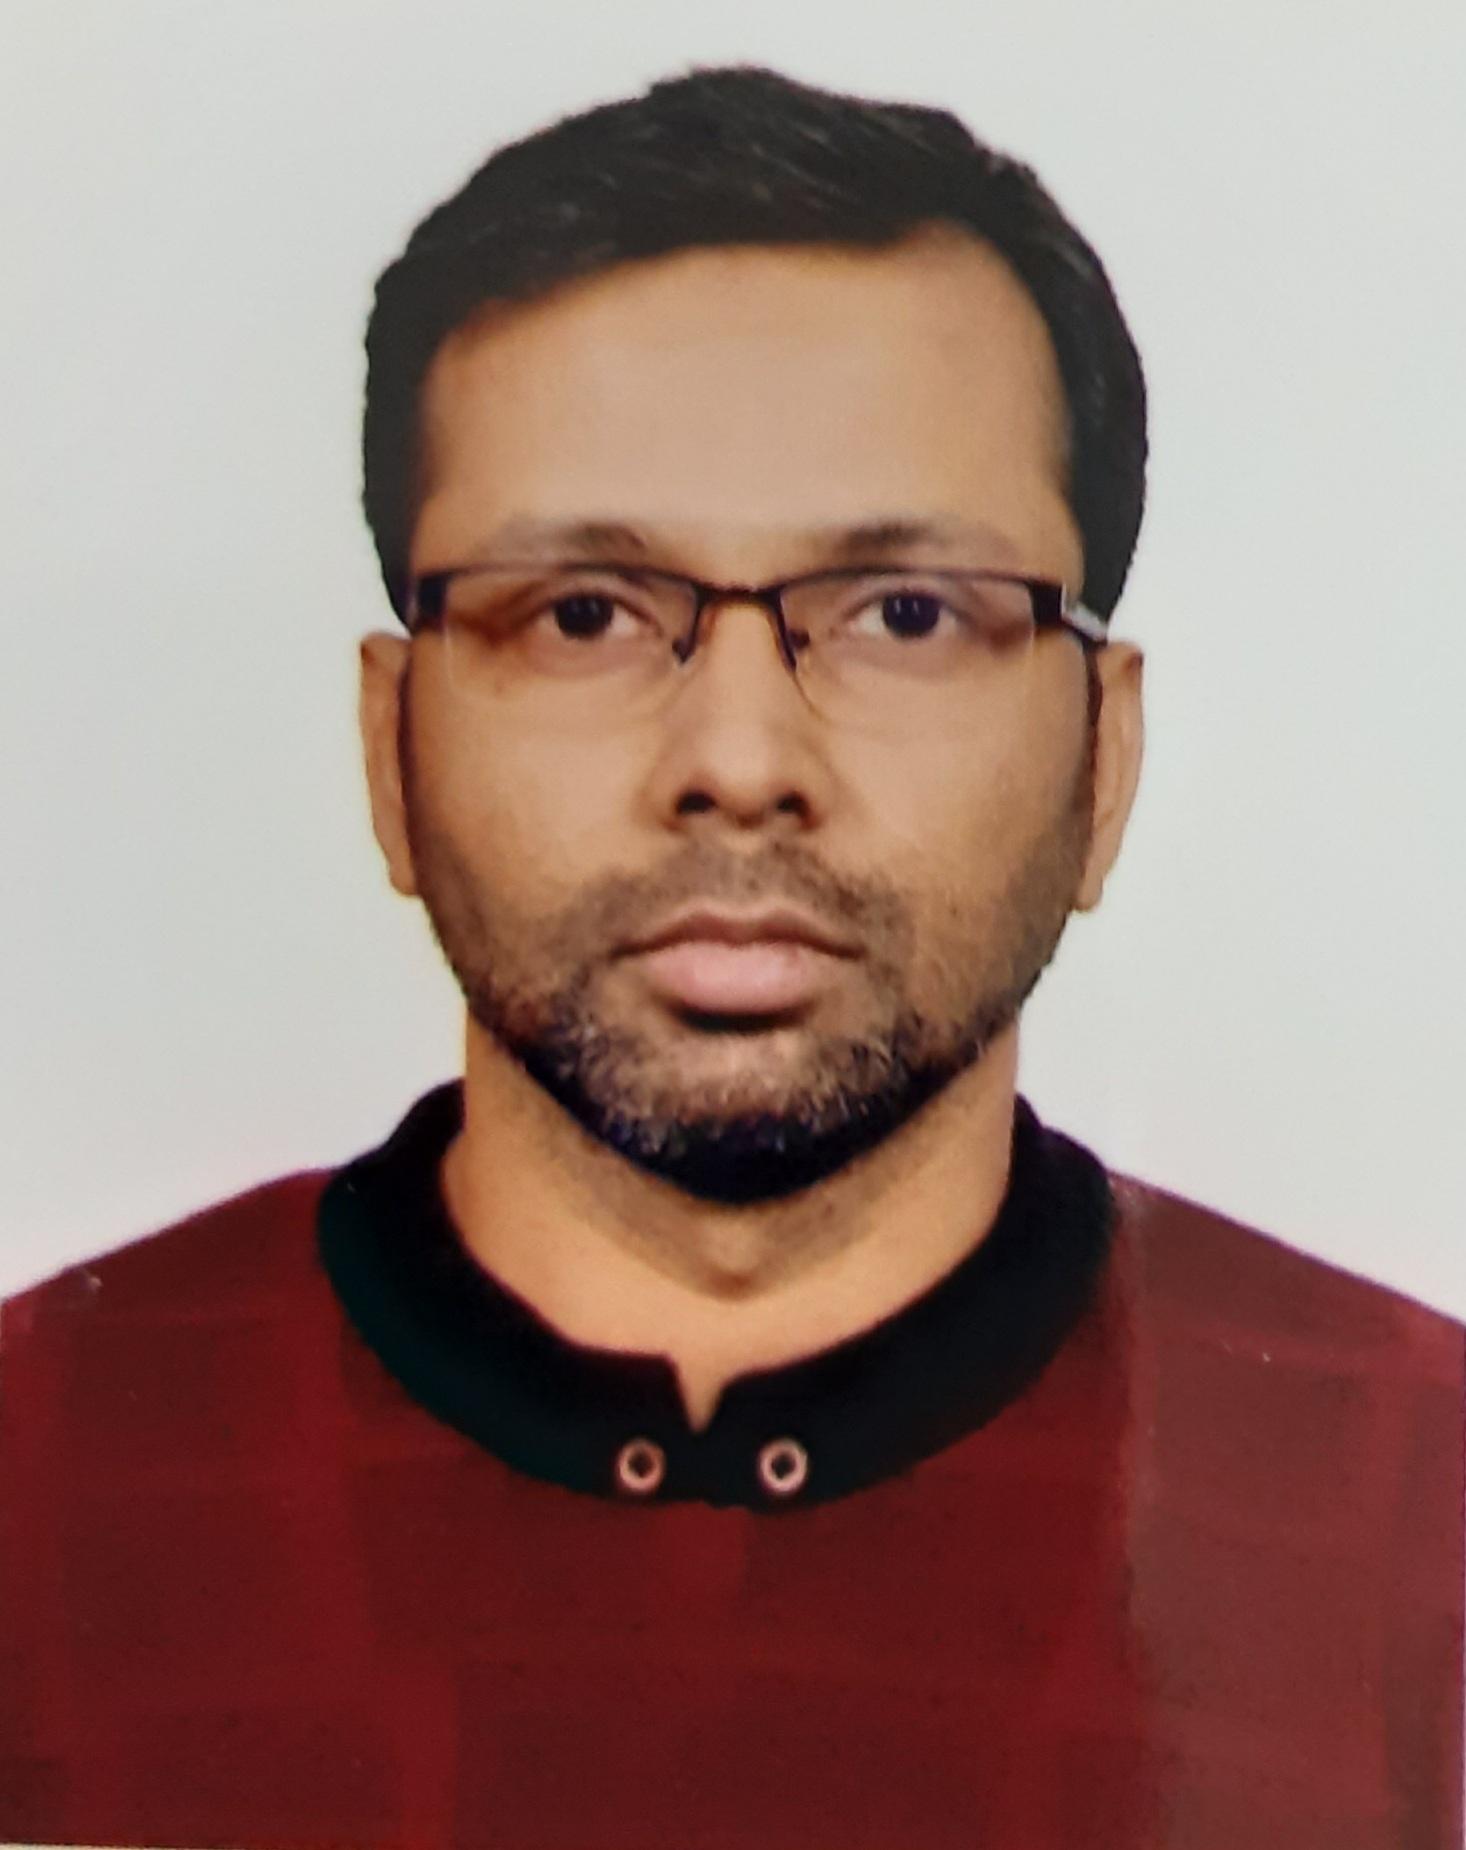 Md Mostofa Kamal Rasel